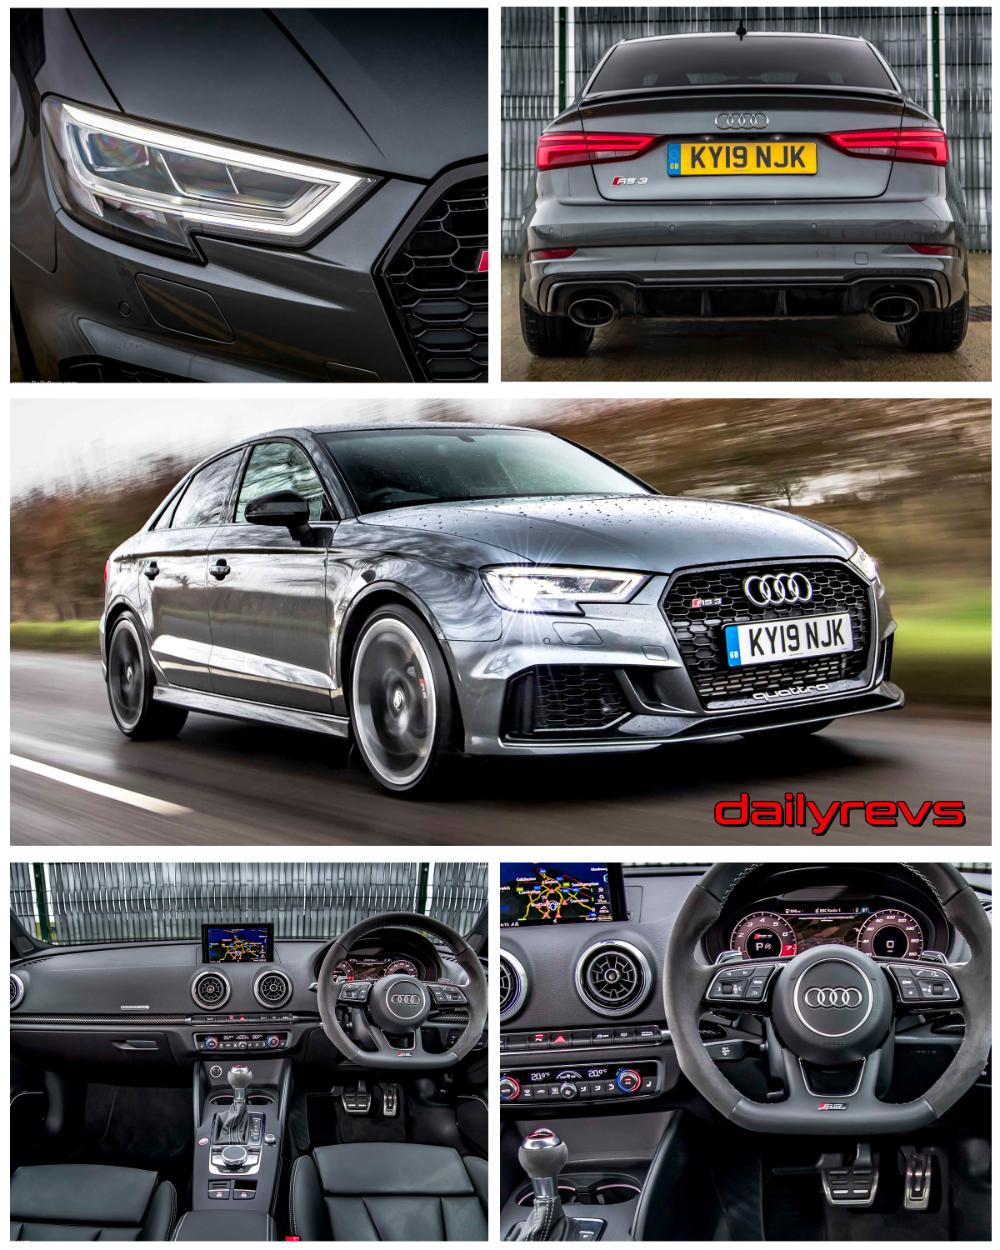 2020 Audi Rs 3 Sedan Uk Hd Pictures Videos Specs Information Audi Rs Audi Sedan